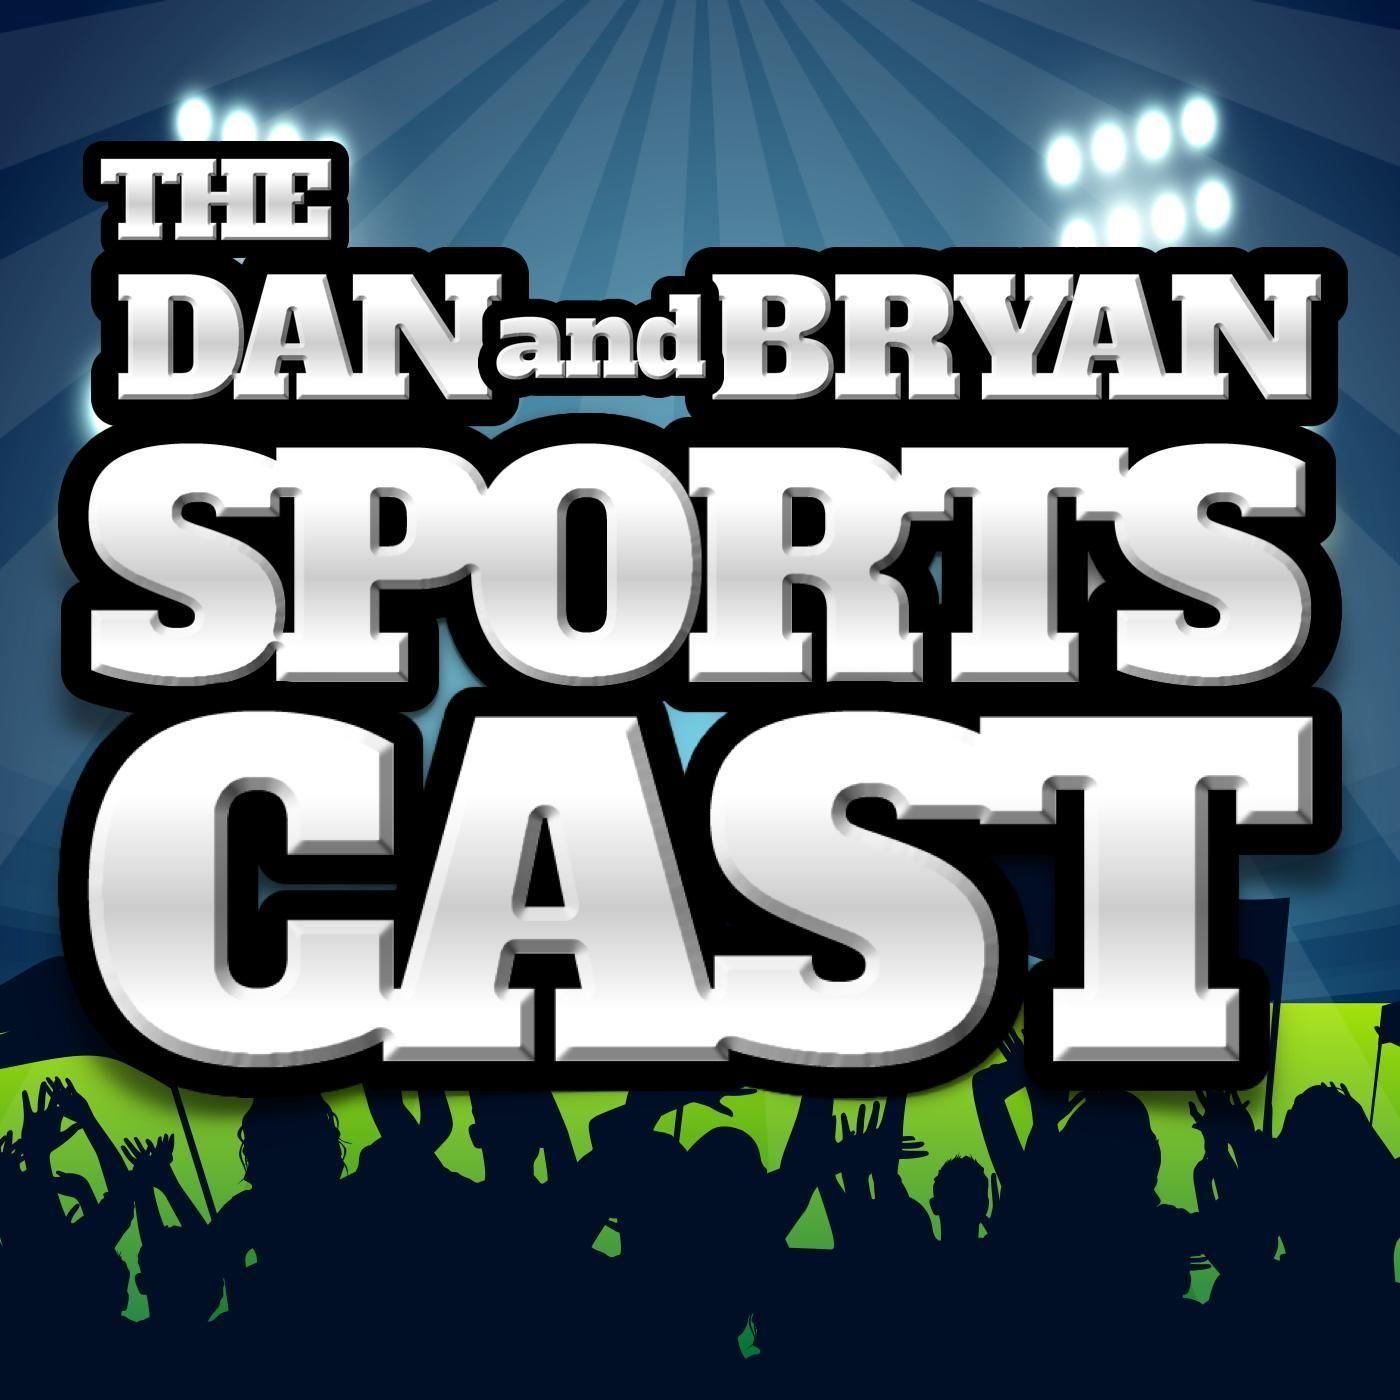 058: UFC 214, Steve Bartman, Lavarr Ball, NFL HOF